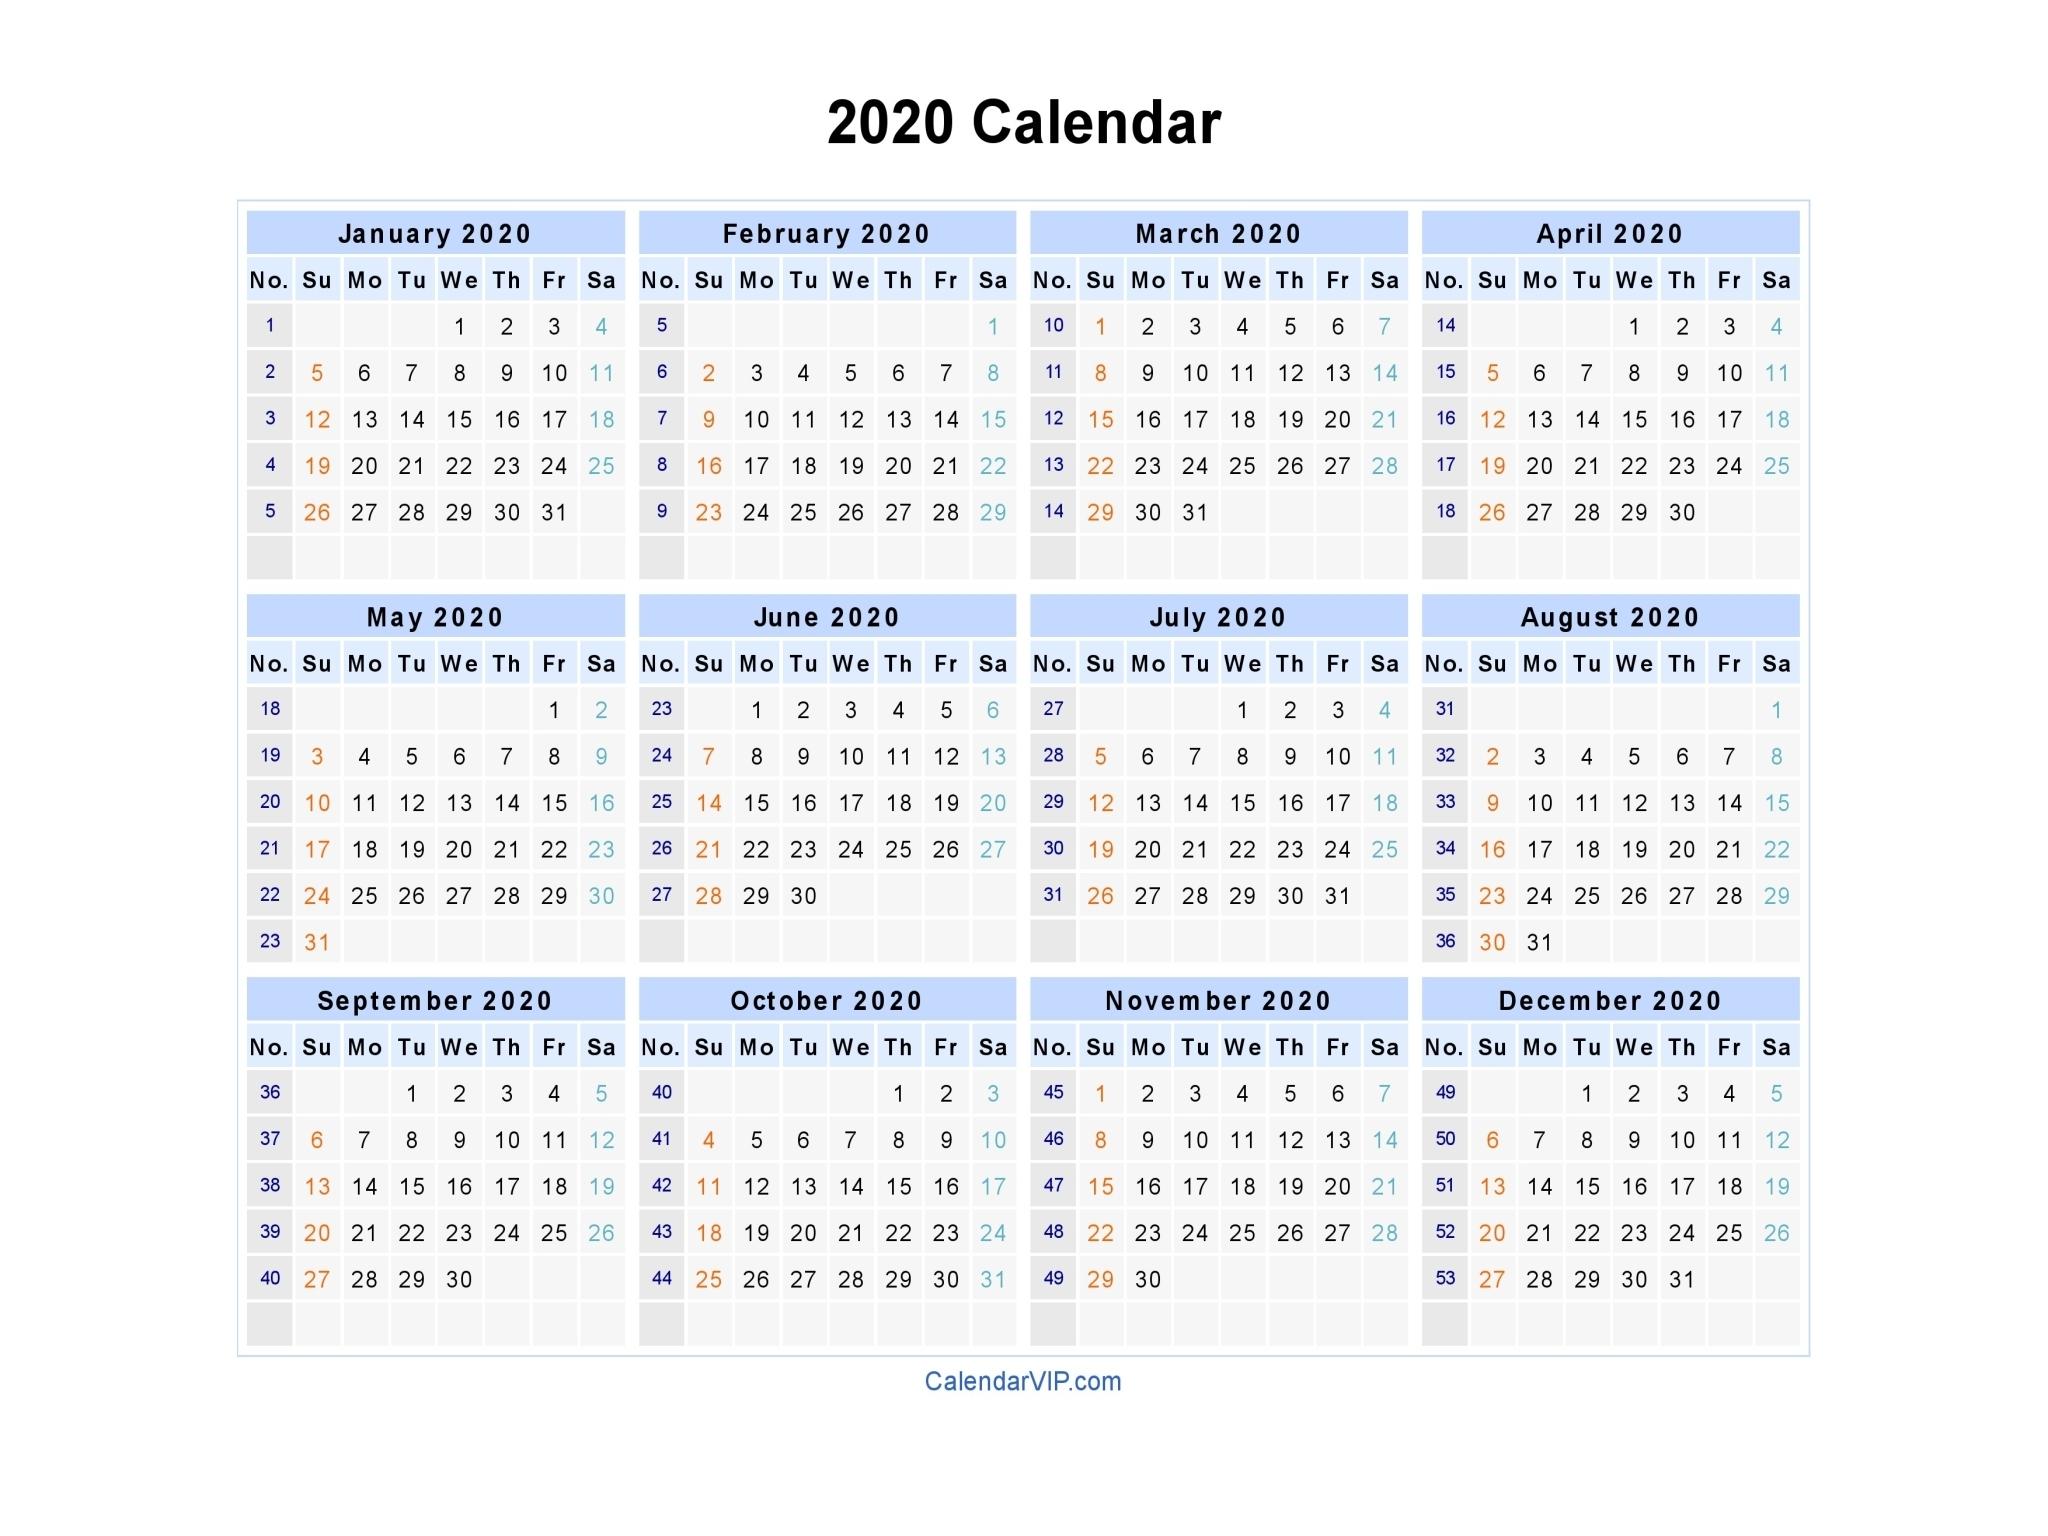 2020 Calendar - Blank Printable Calendar Template In Pdf